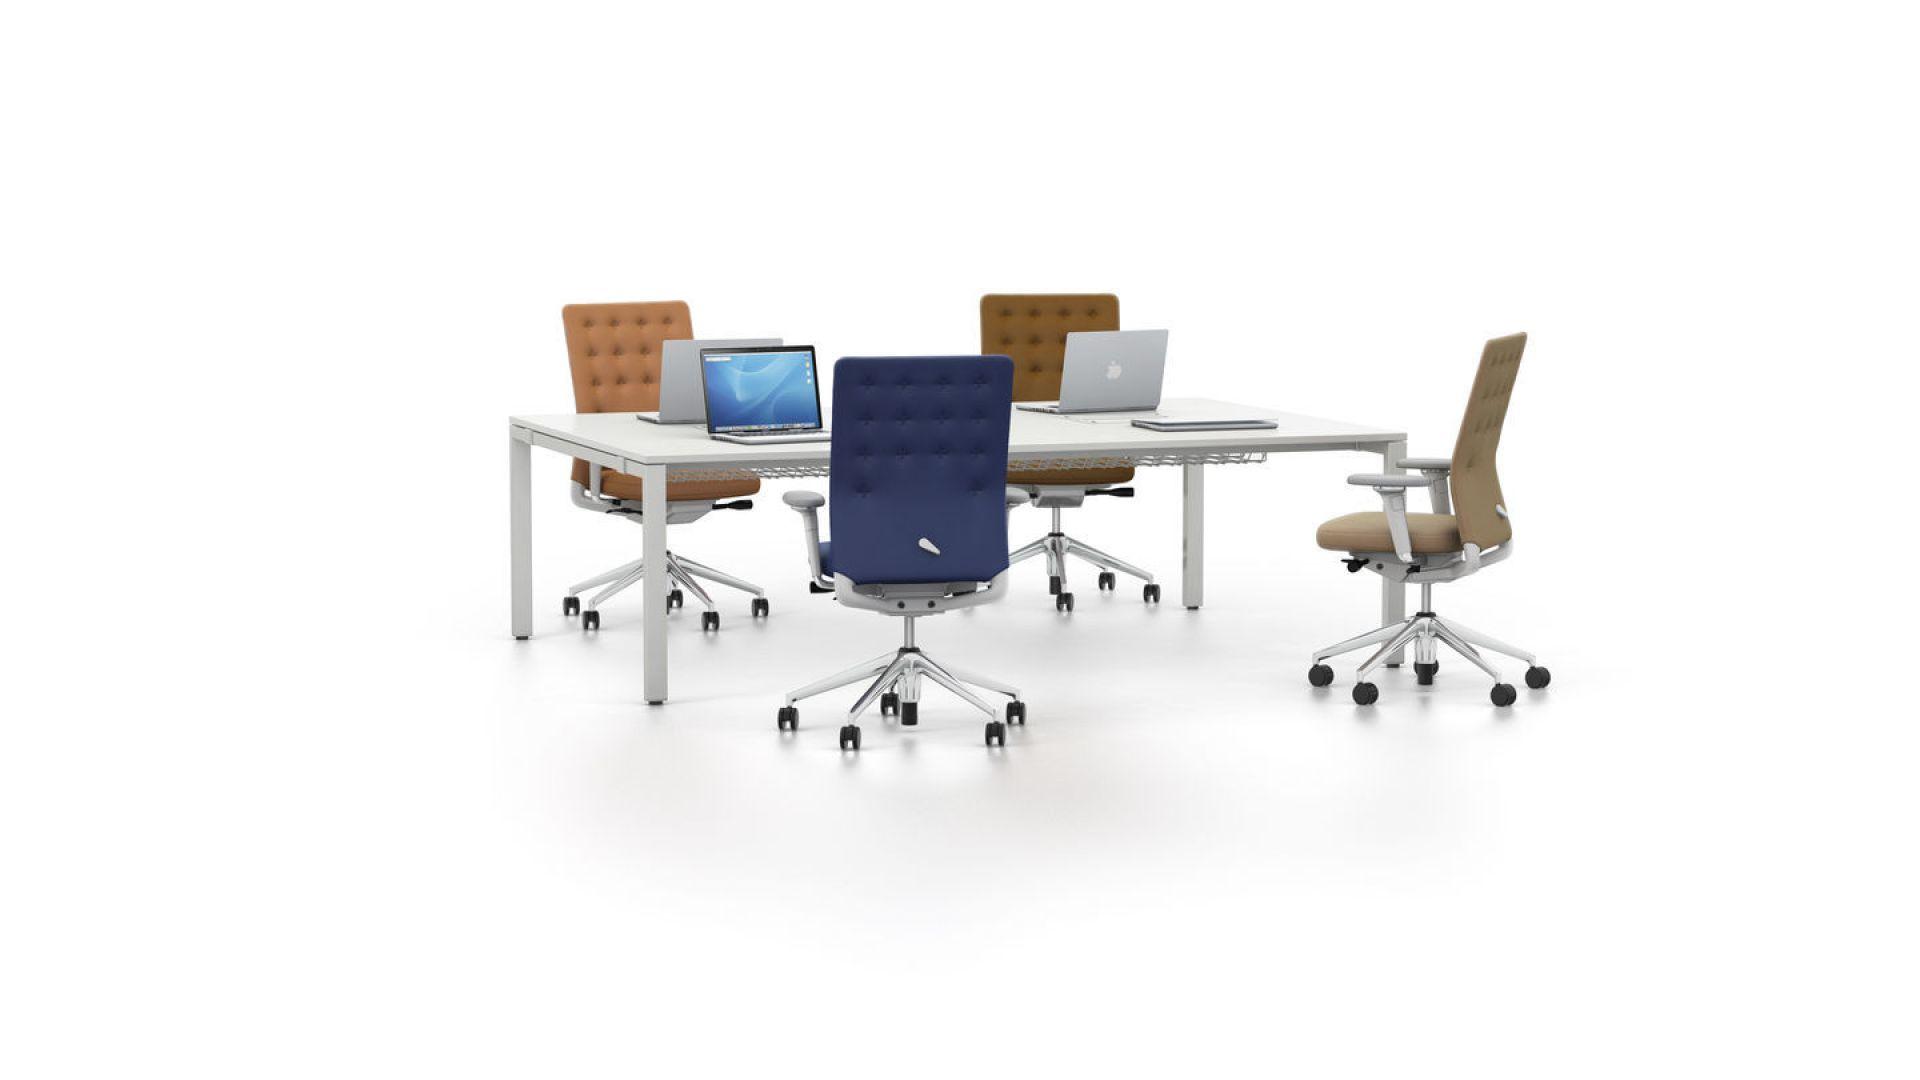 ID Chair - ID Trim ohne Lumbalstütze Bürodrehstuhl Vitra